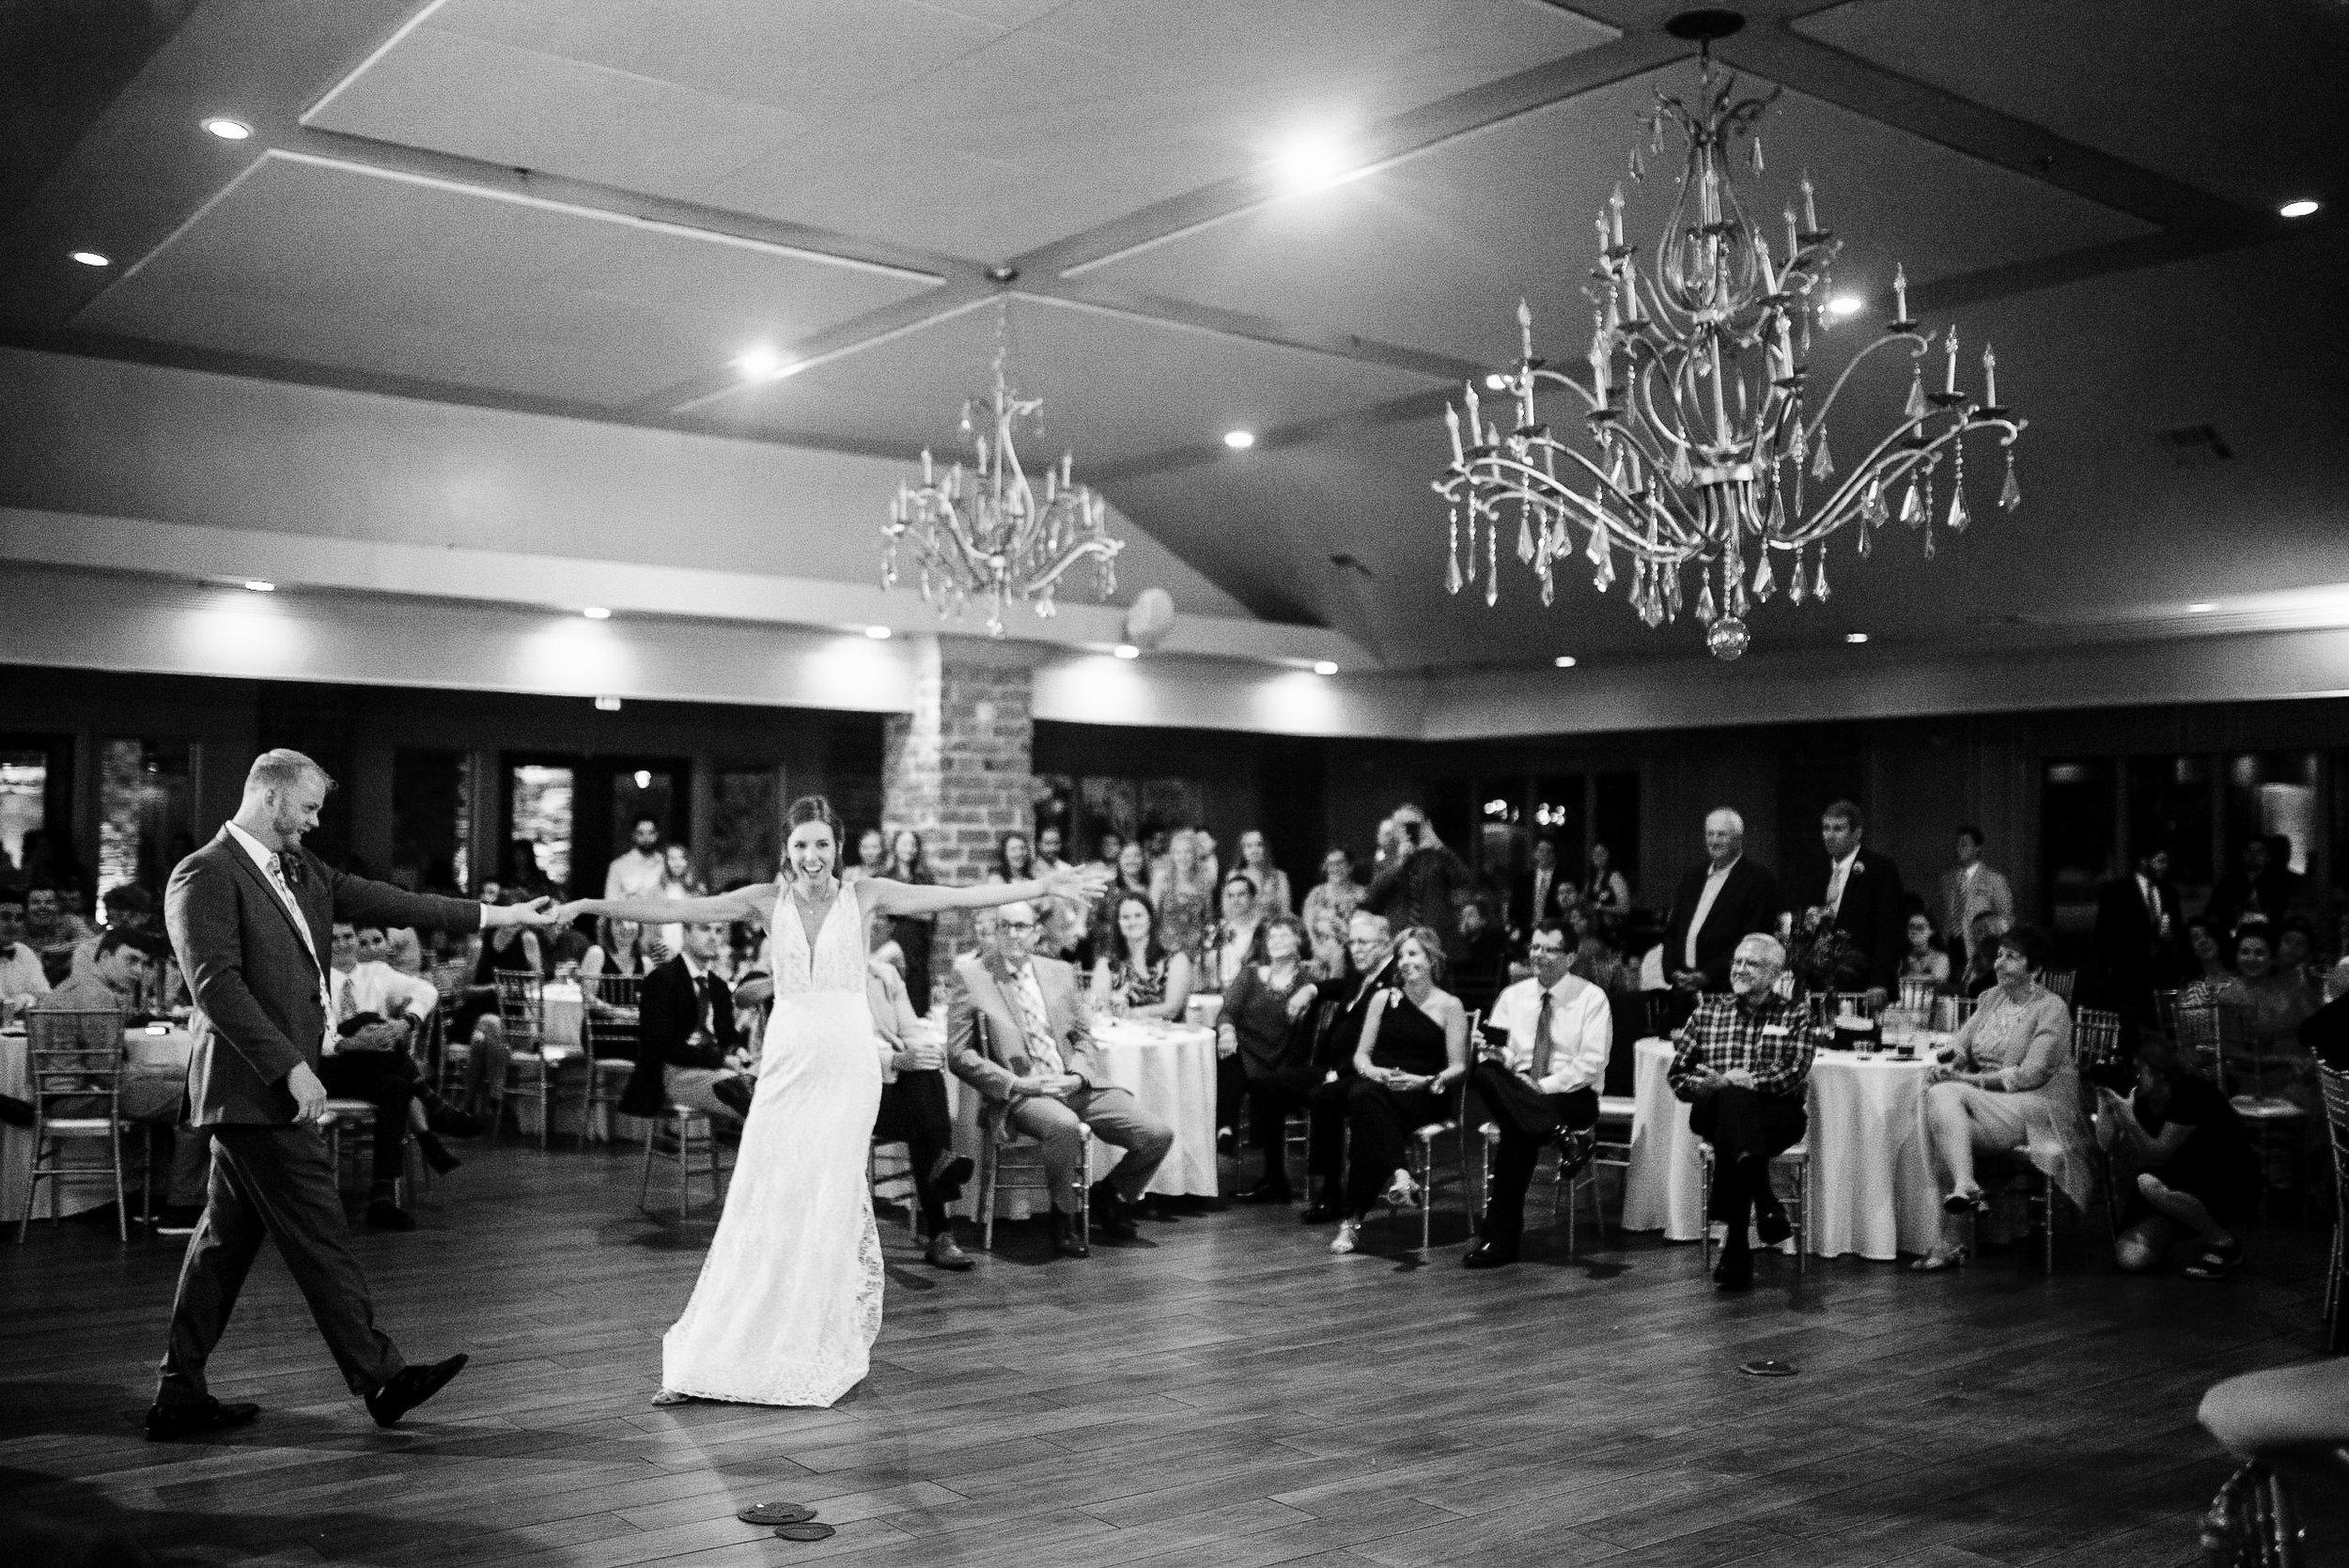 okc-wedding-photographer-coles-garden-wedding-okc-best-wedding-photographers-177.jpg